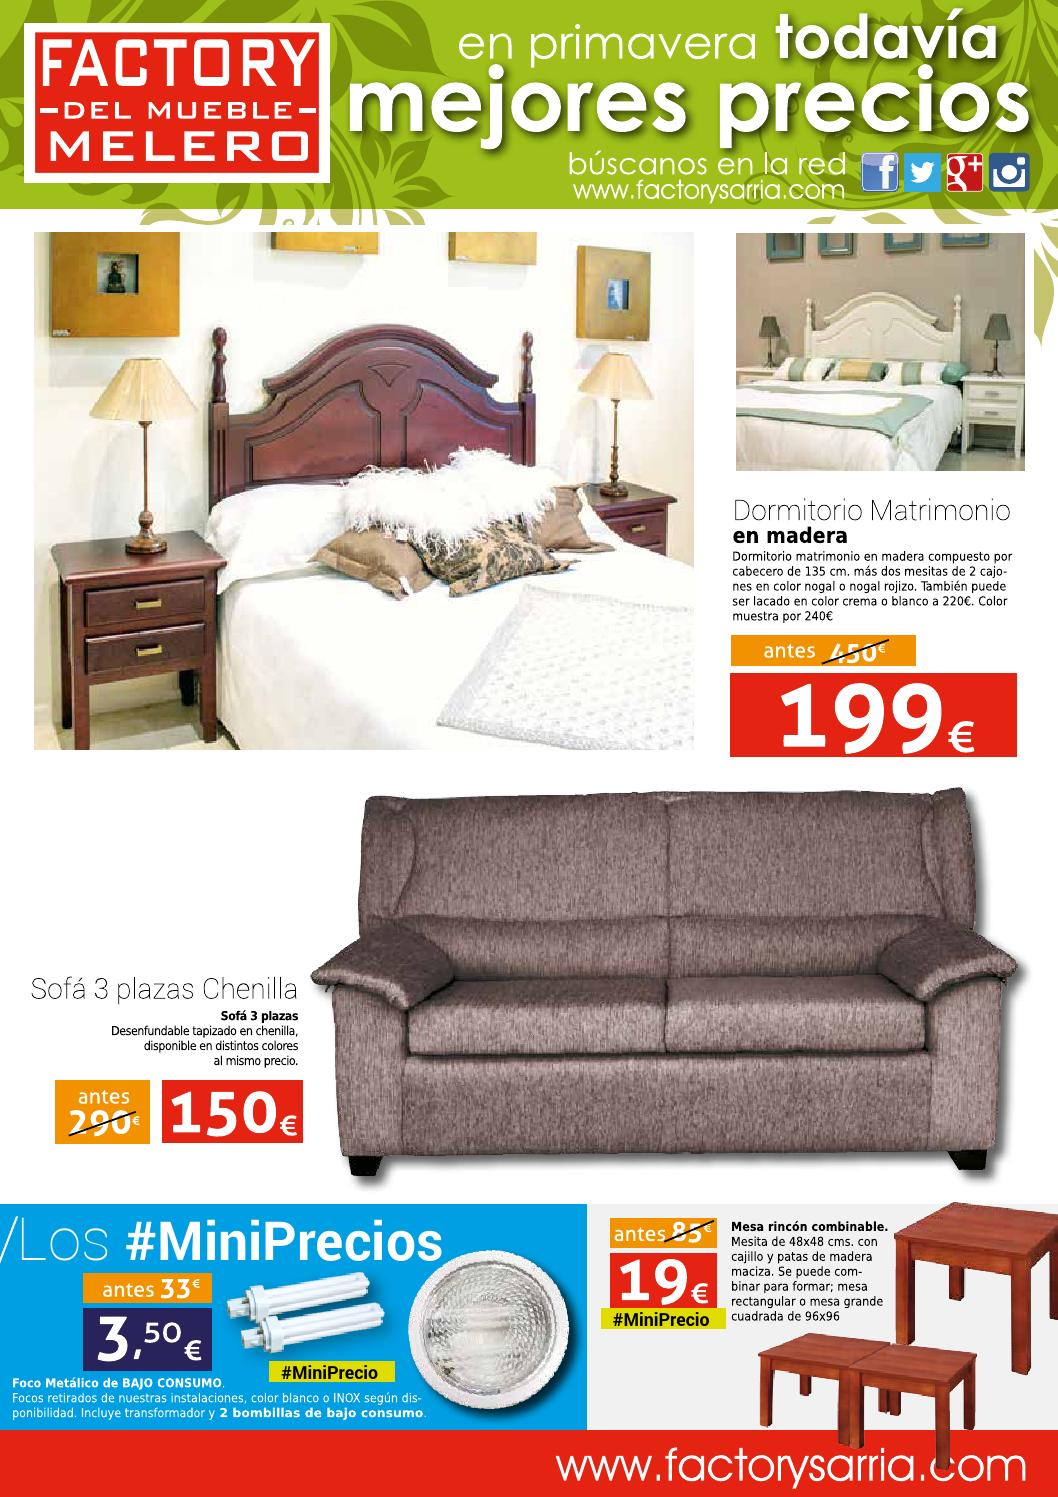 Factory febrero 2015 issuu by muebles sarria issuu for Muebles sarria dos hermanas